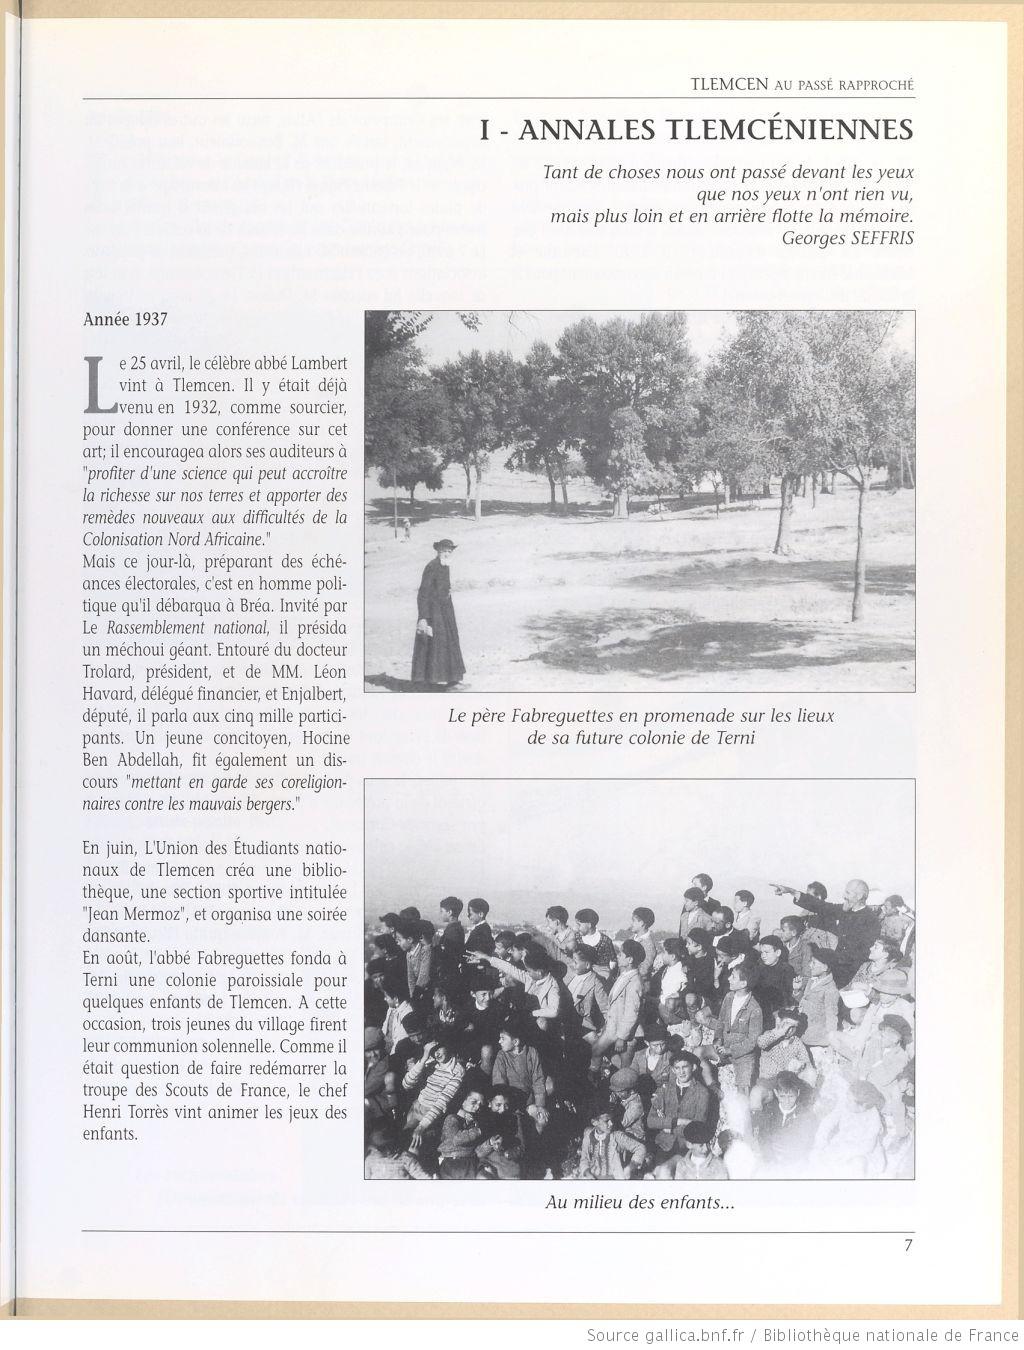 Tlemcen au passe rapproche 1937